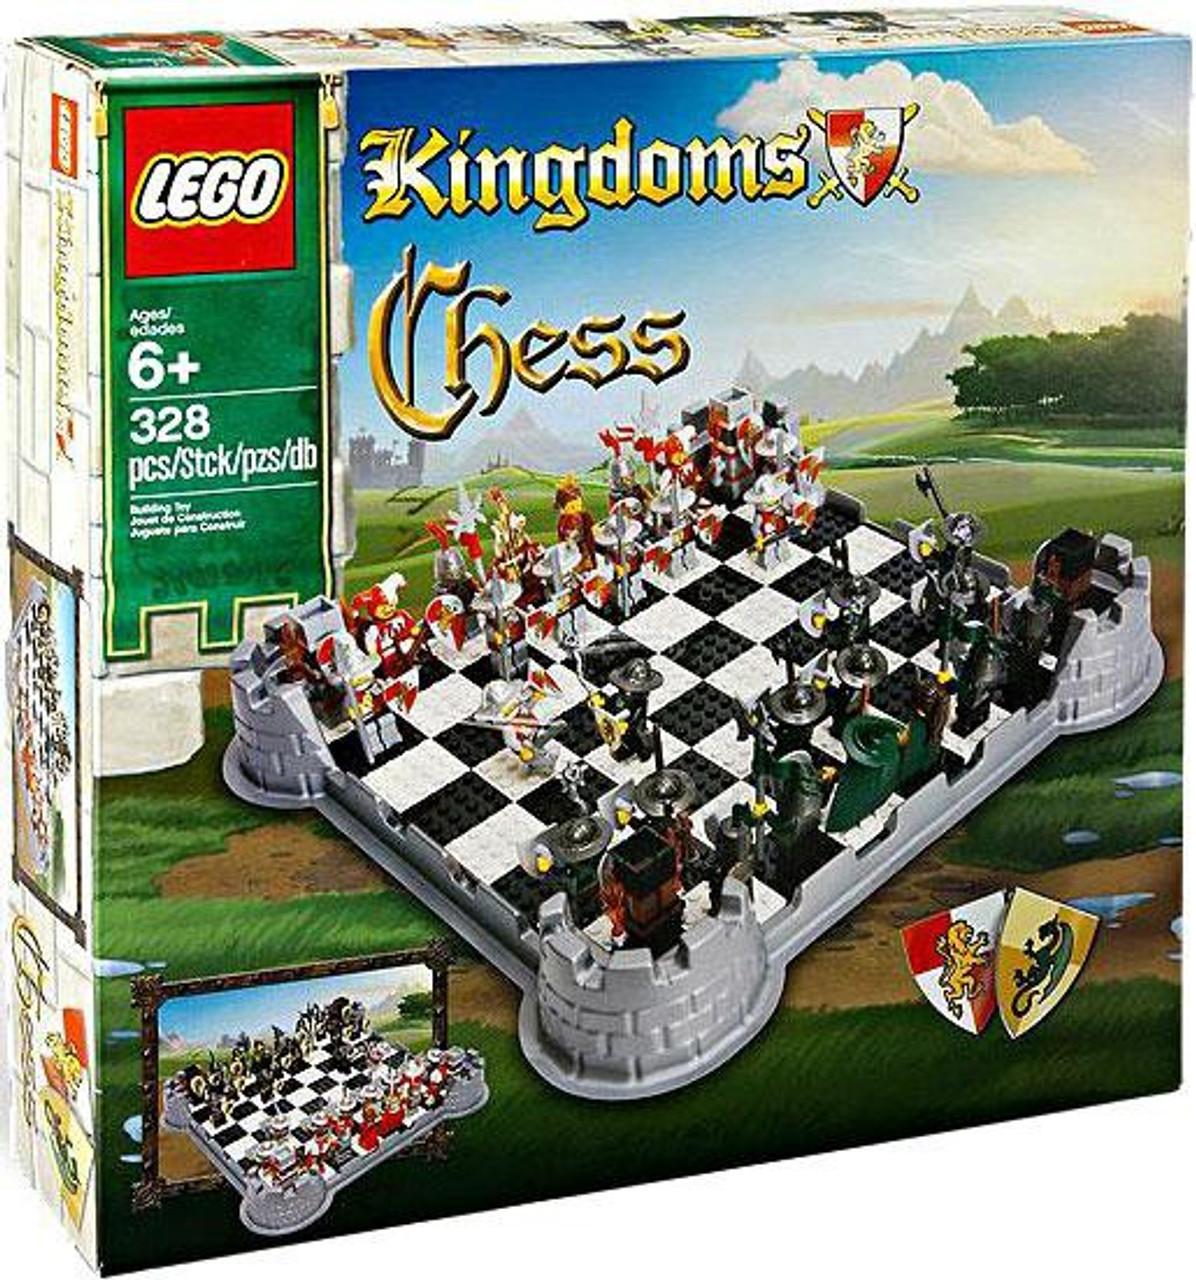 LEGO Kingdoms Chess Set 853373 - ToyWiz